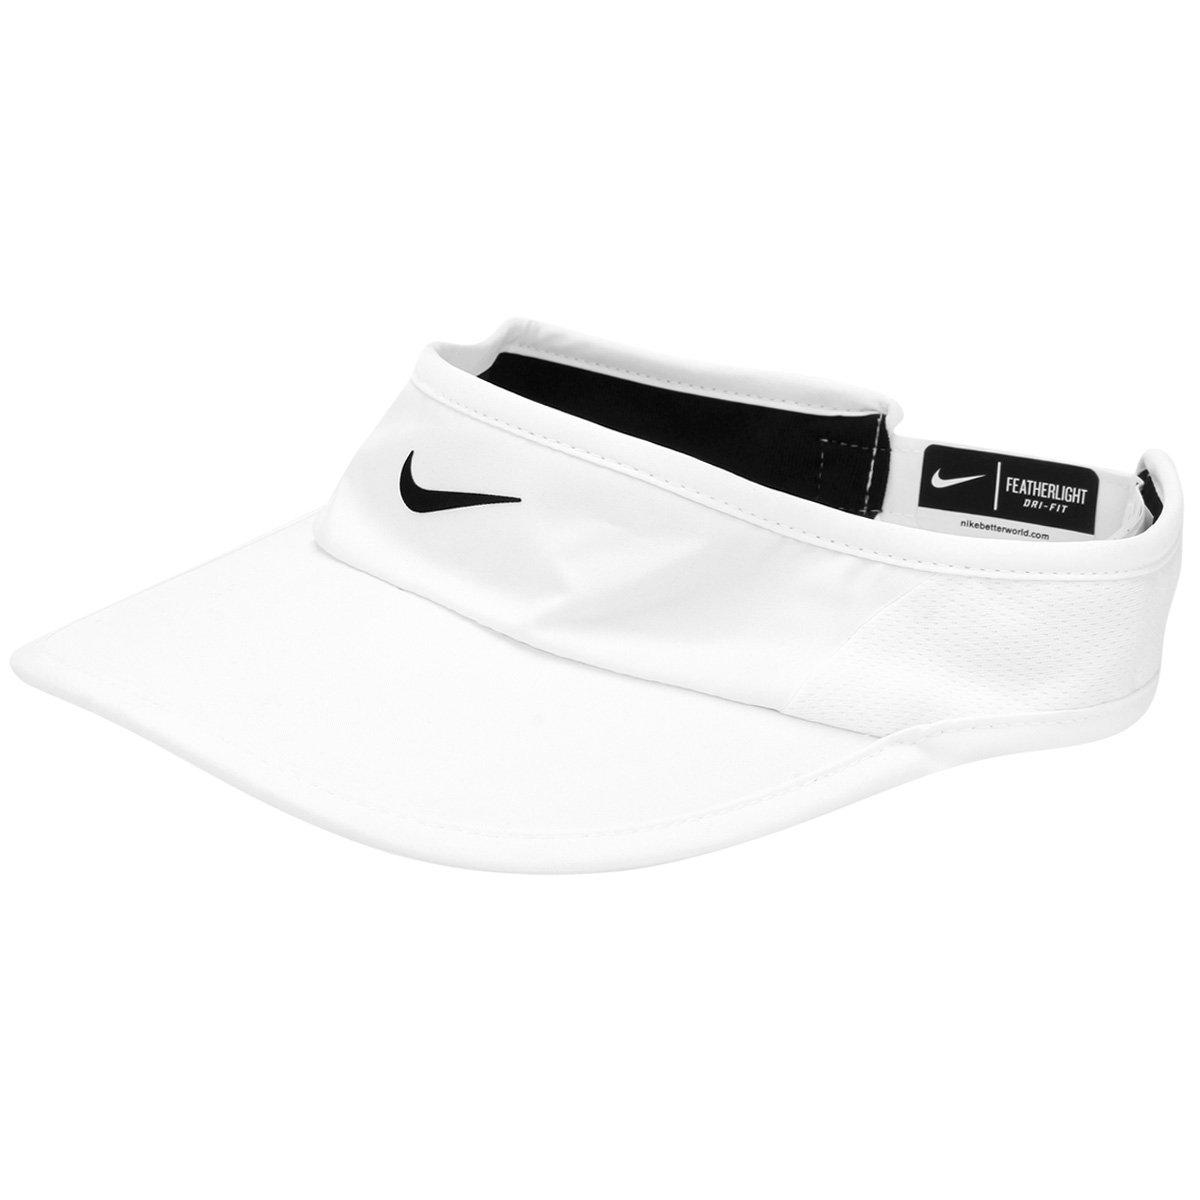 2b2b3dac8258d Viseira Nike Featherlight 2.0 - Compre Agora